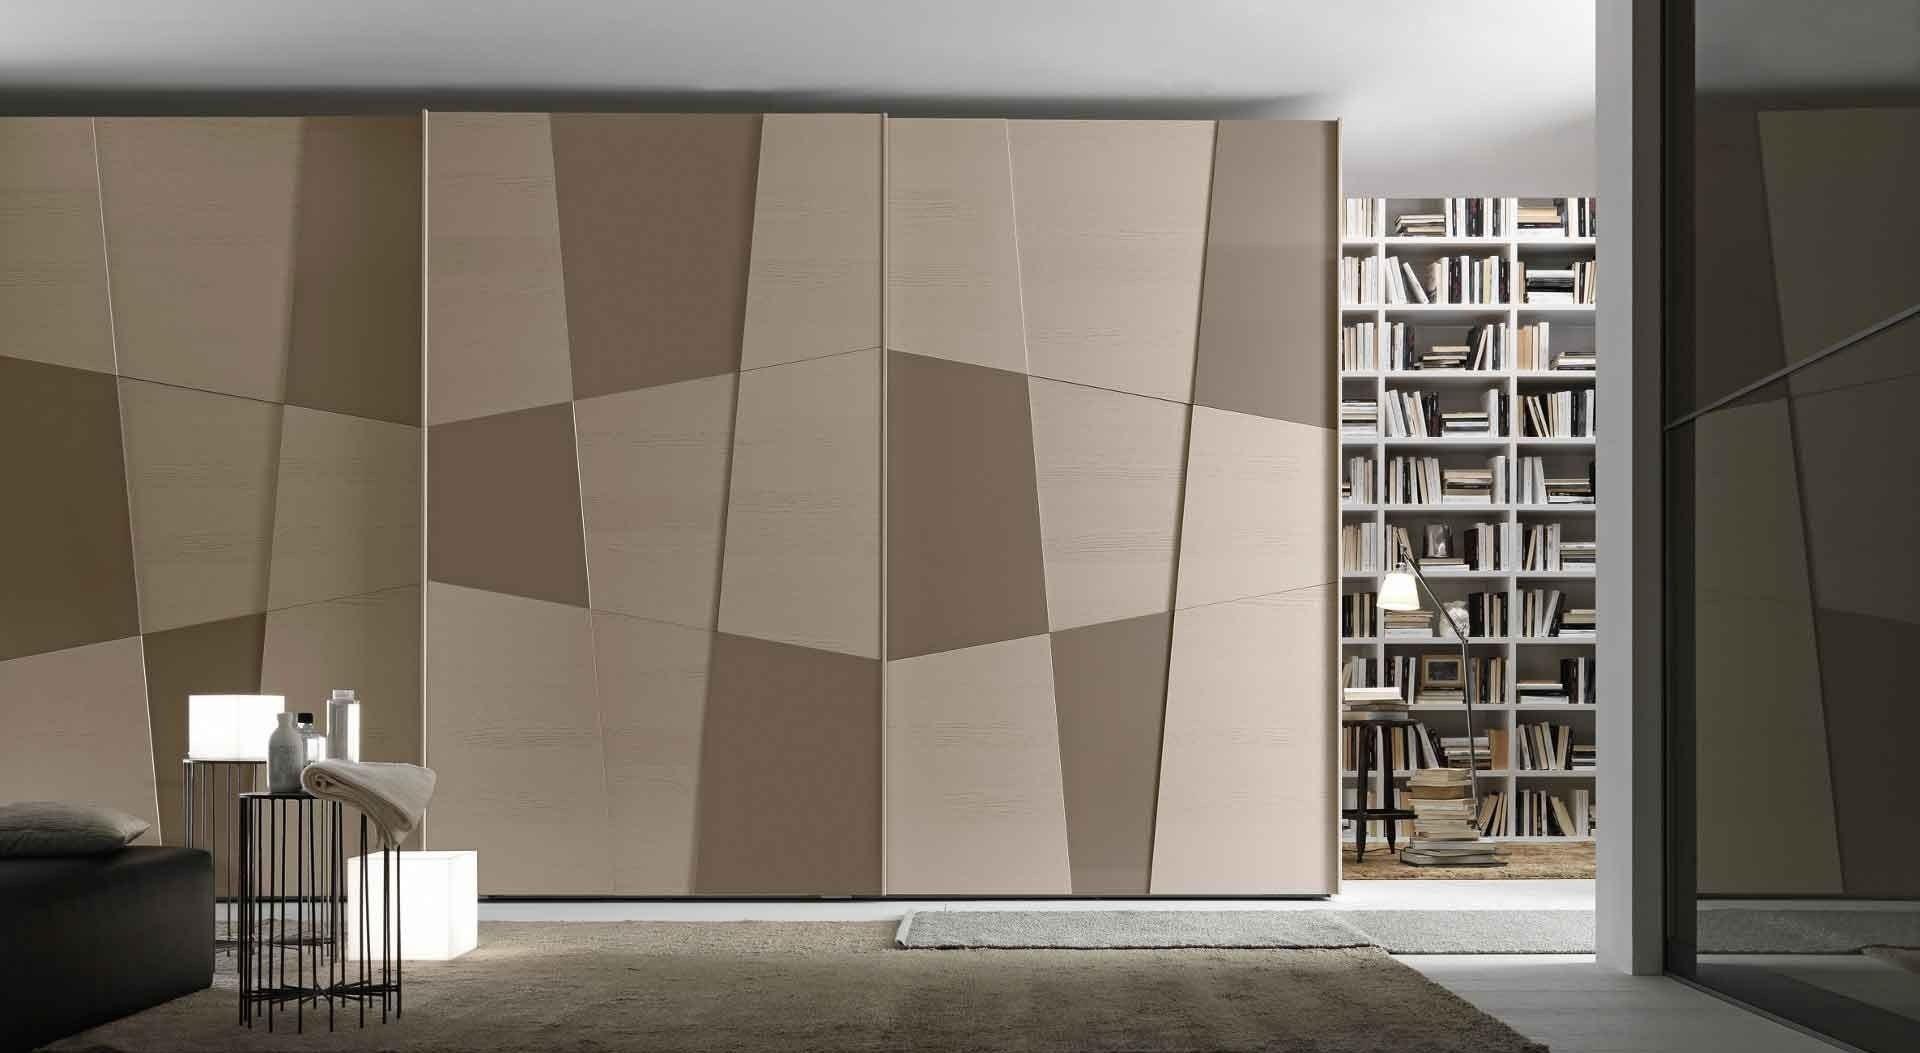 Wardrobe Designs 34 Ideas To Organize Your Bedroom Closet - Plan n Design - ZGQLMCN